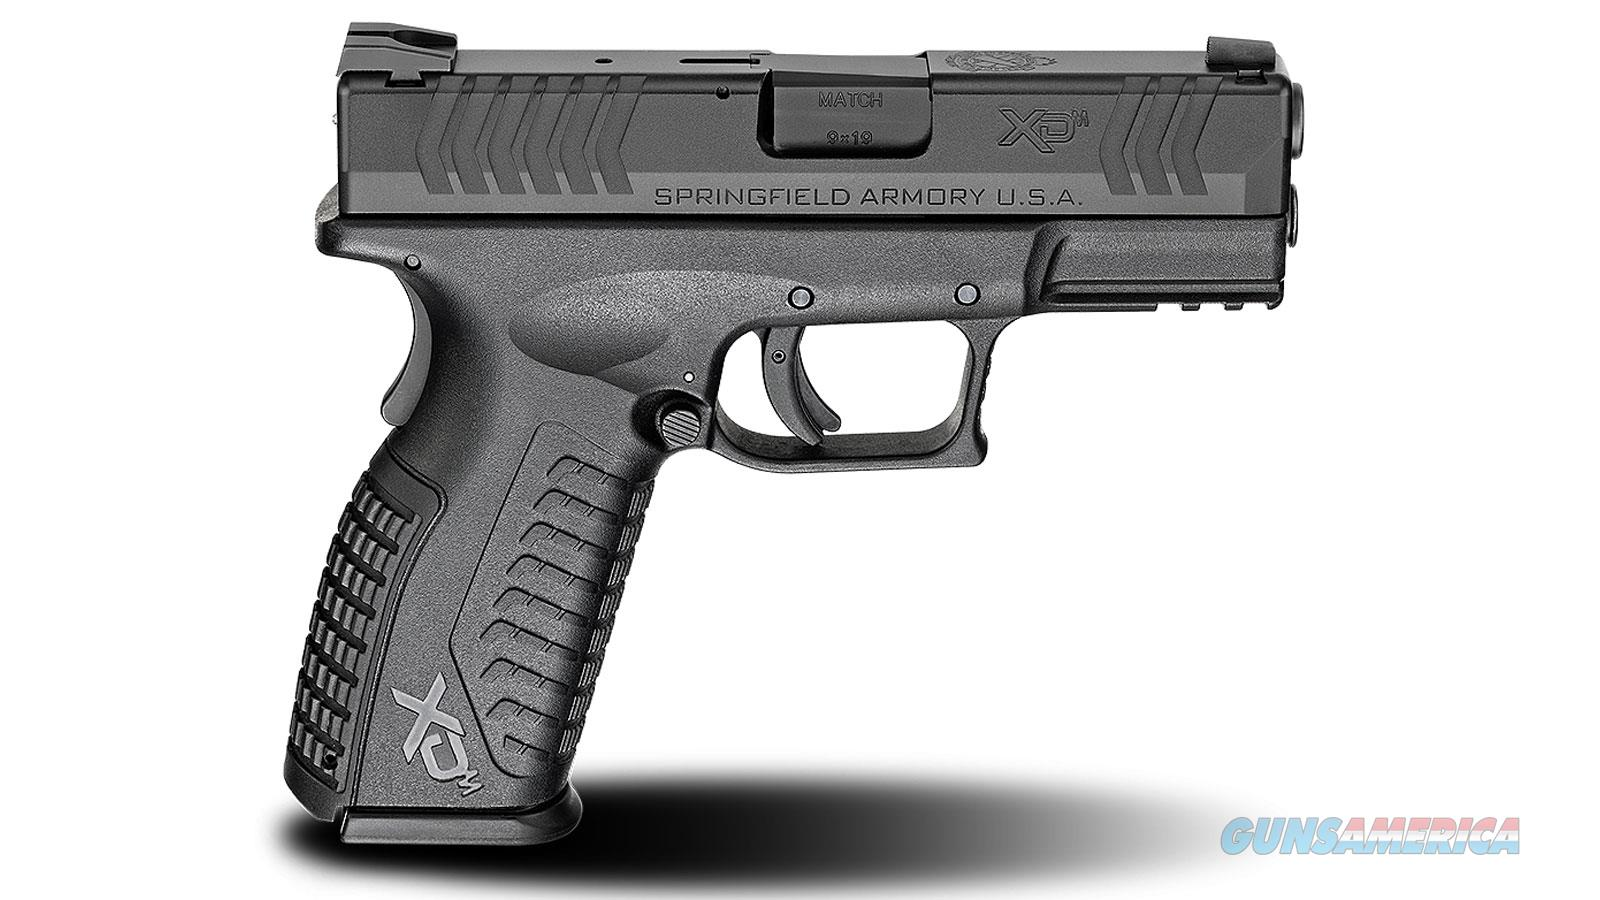 Springfield Armory Xdm 9Mm 3.8 19Rd Essentials XDM9389BHCE  Guns > Pistols > S Misc Pistols